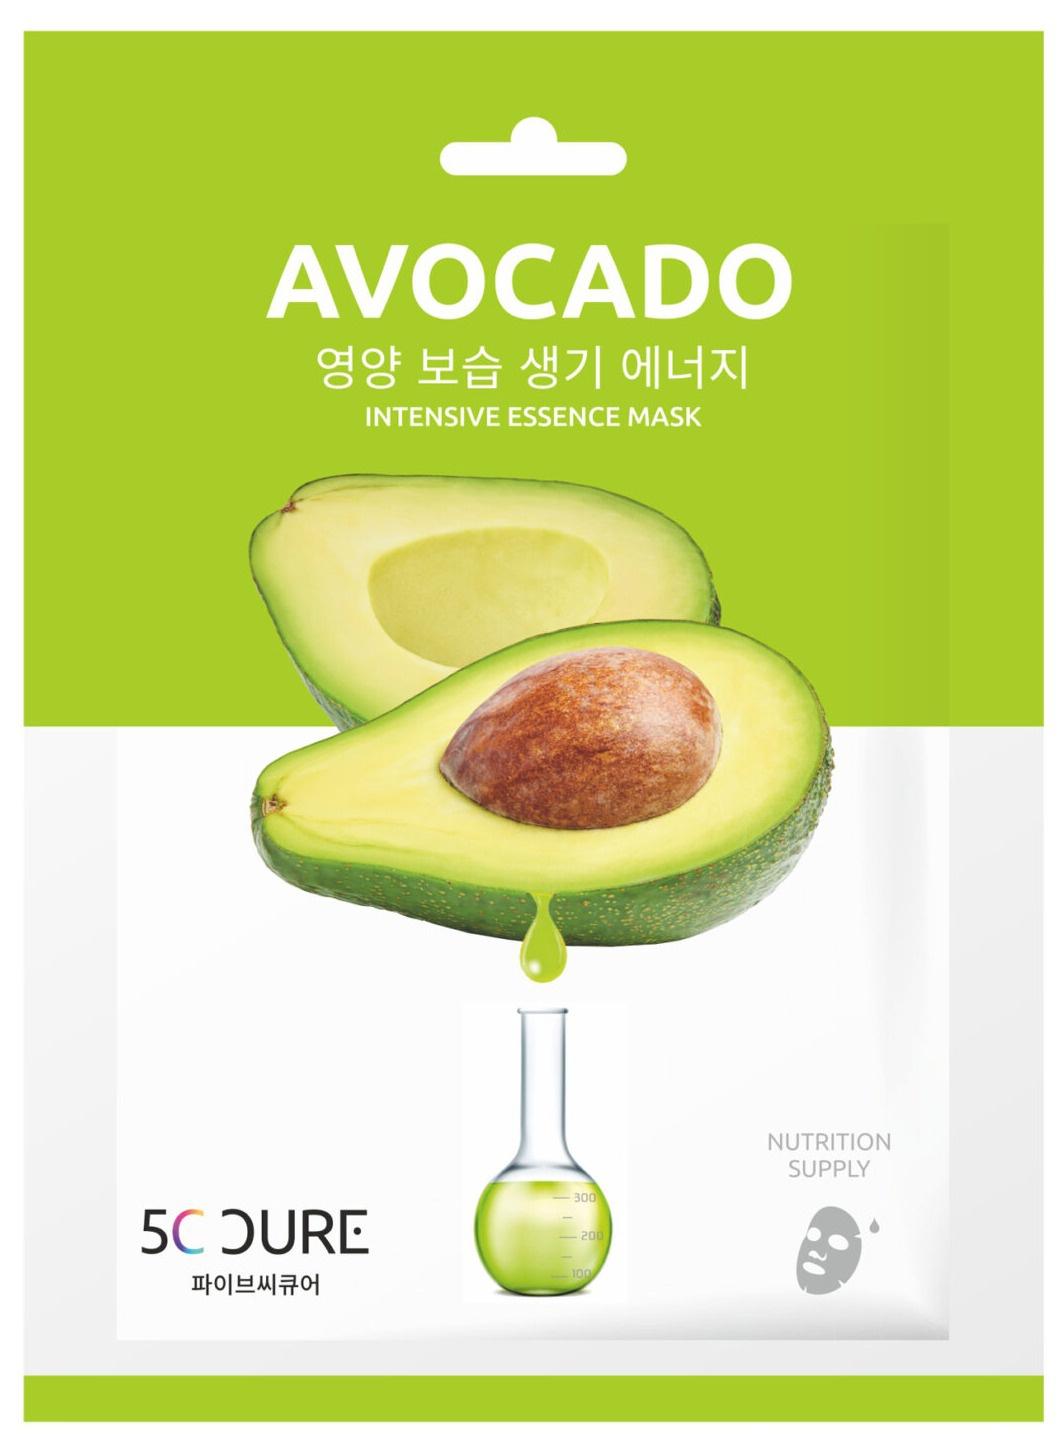 5c cure Avocado Intensive Essence Mask